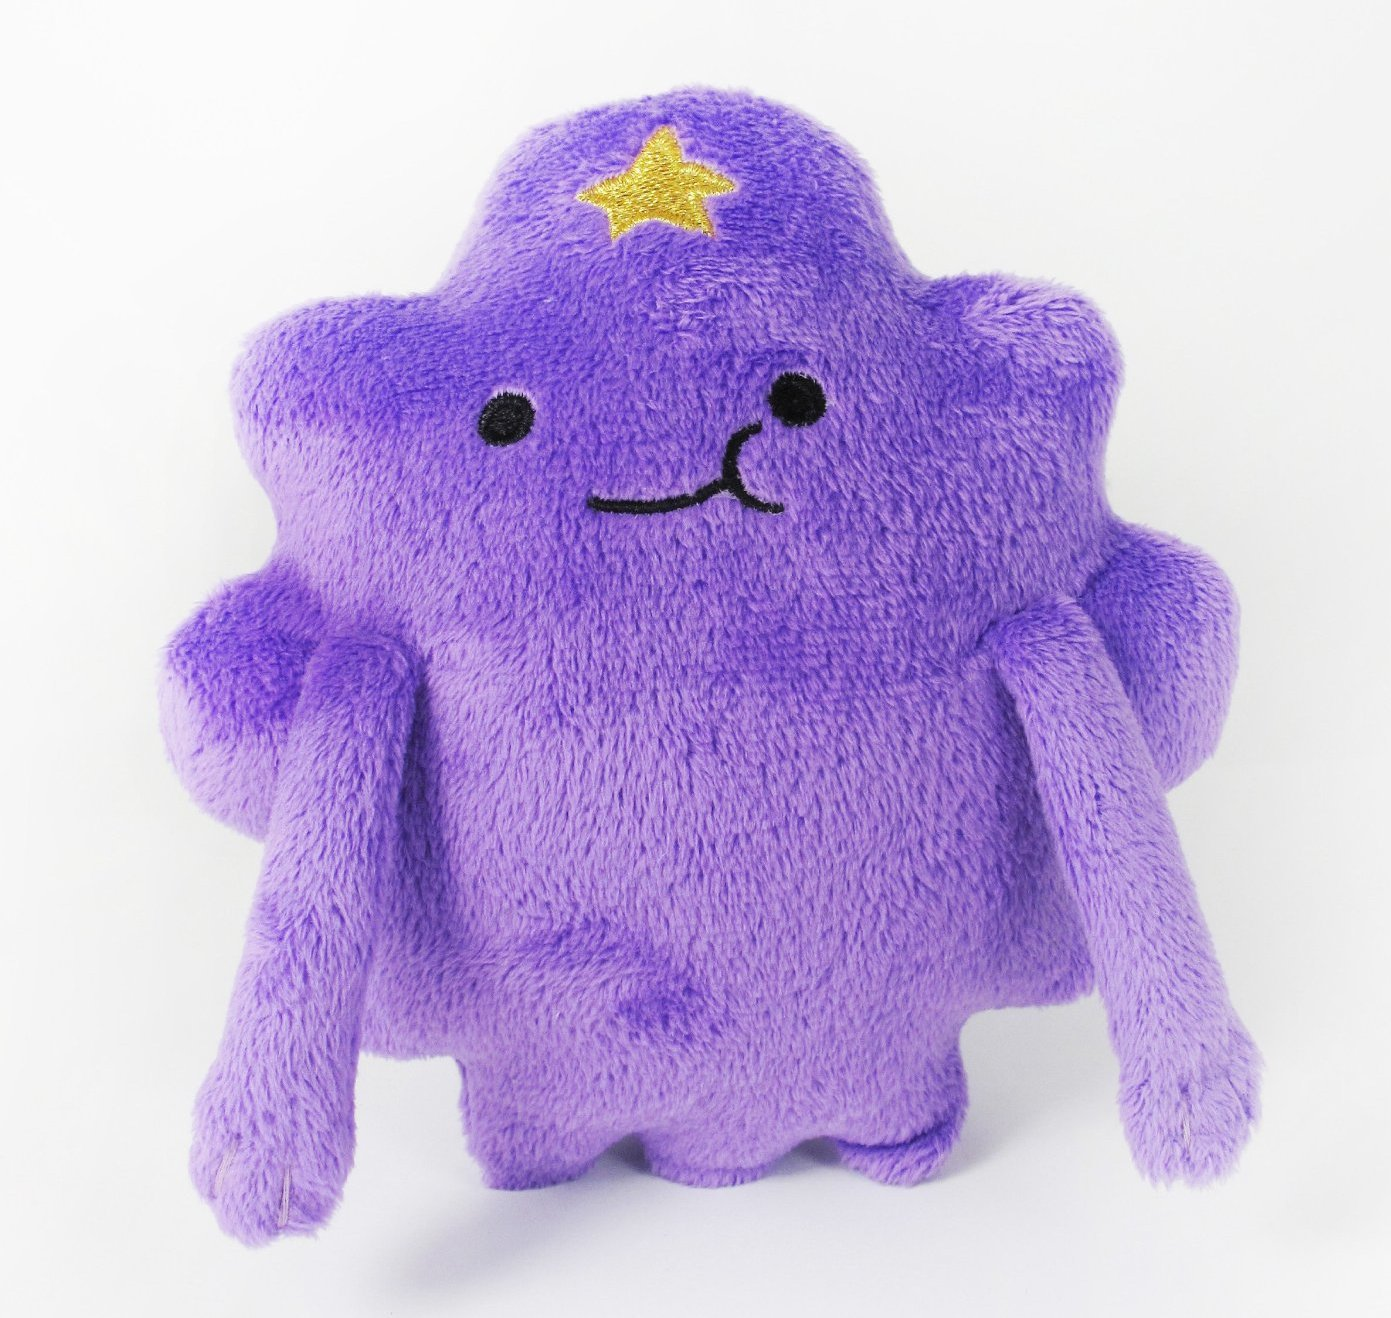 Adventure Time Fan Favorite Plush - Lumpy Princess